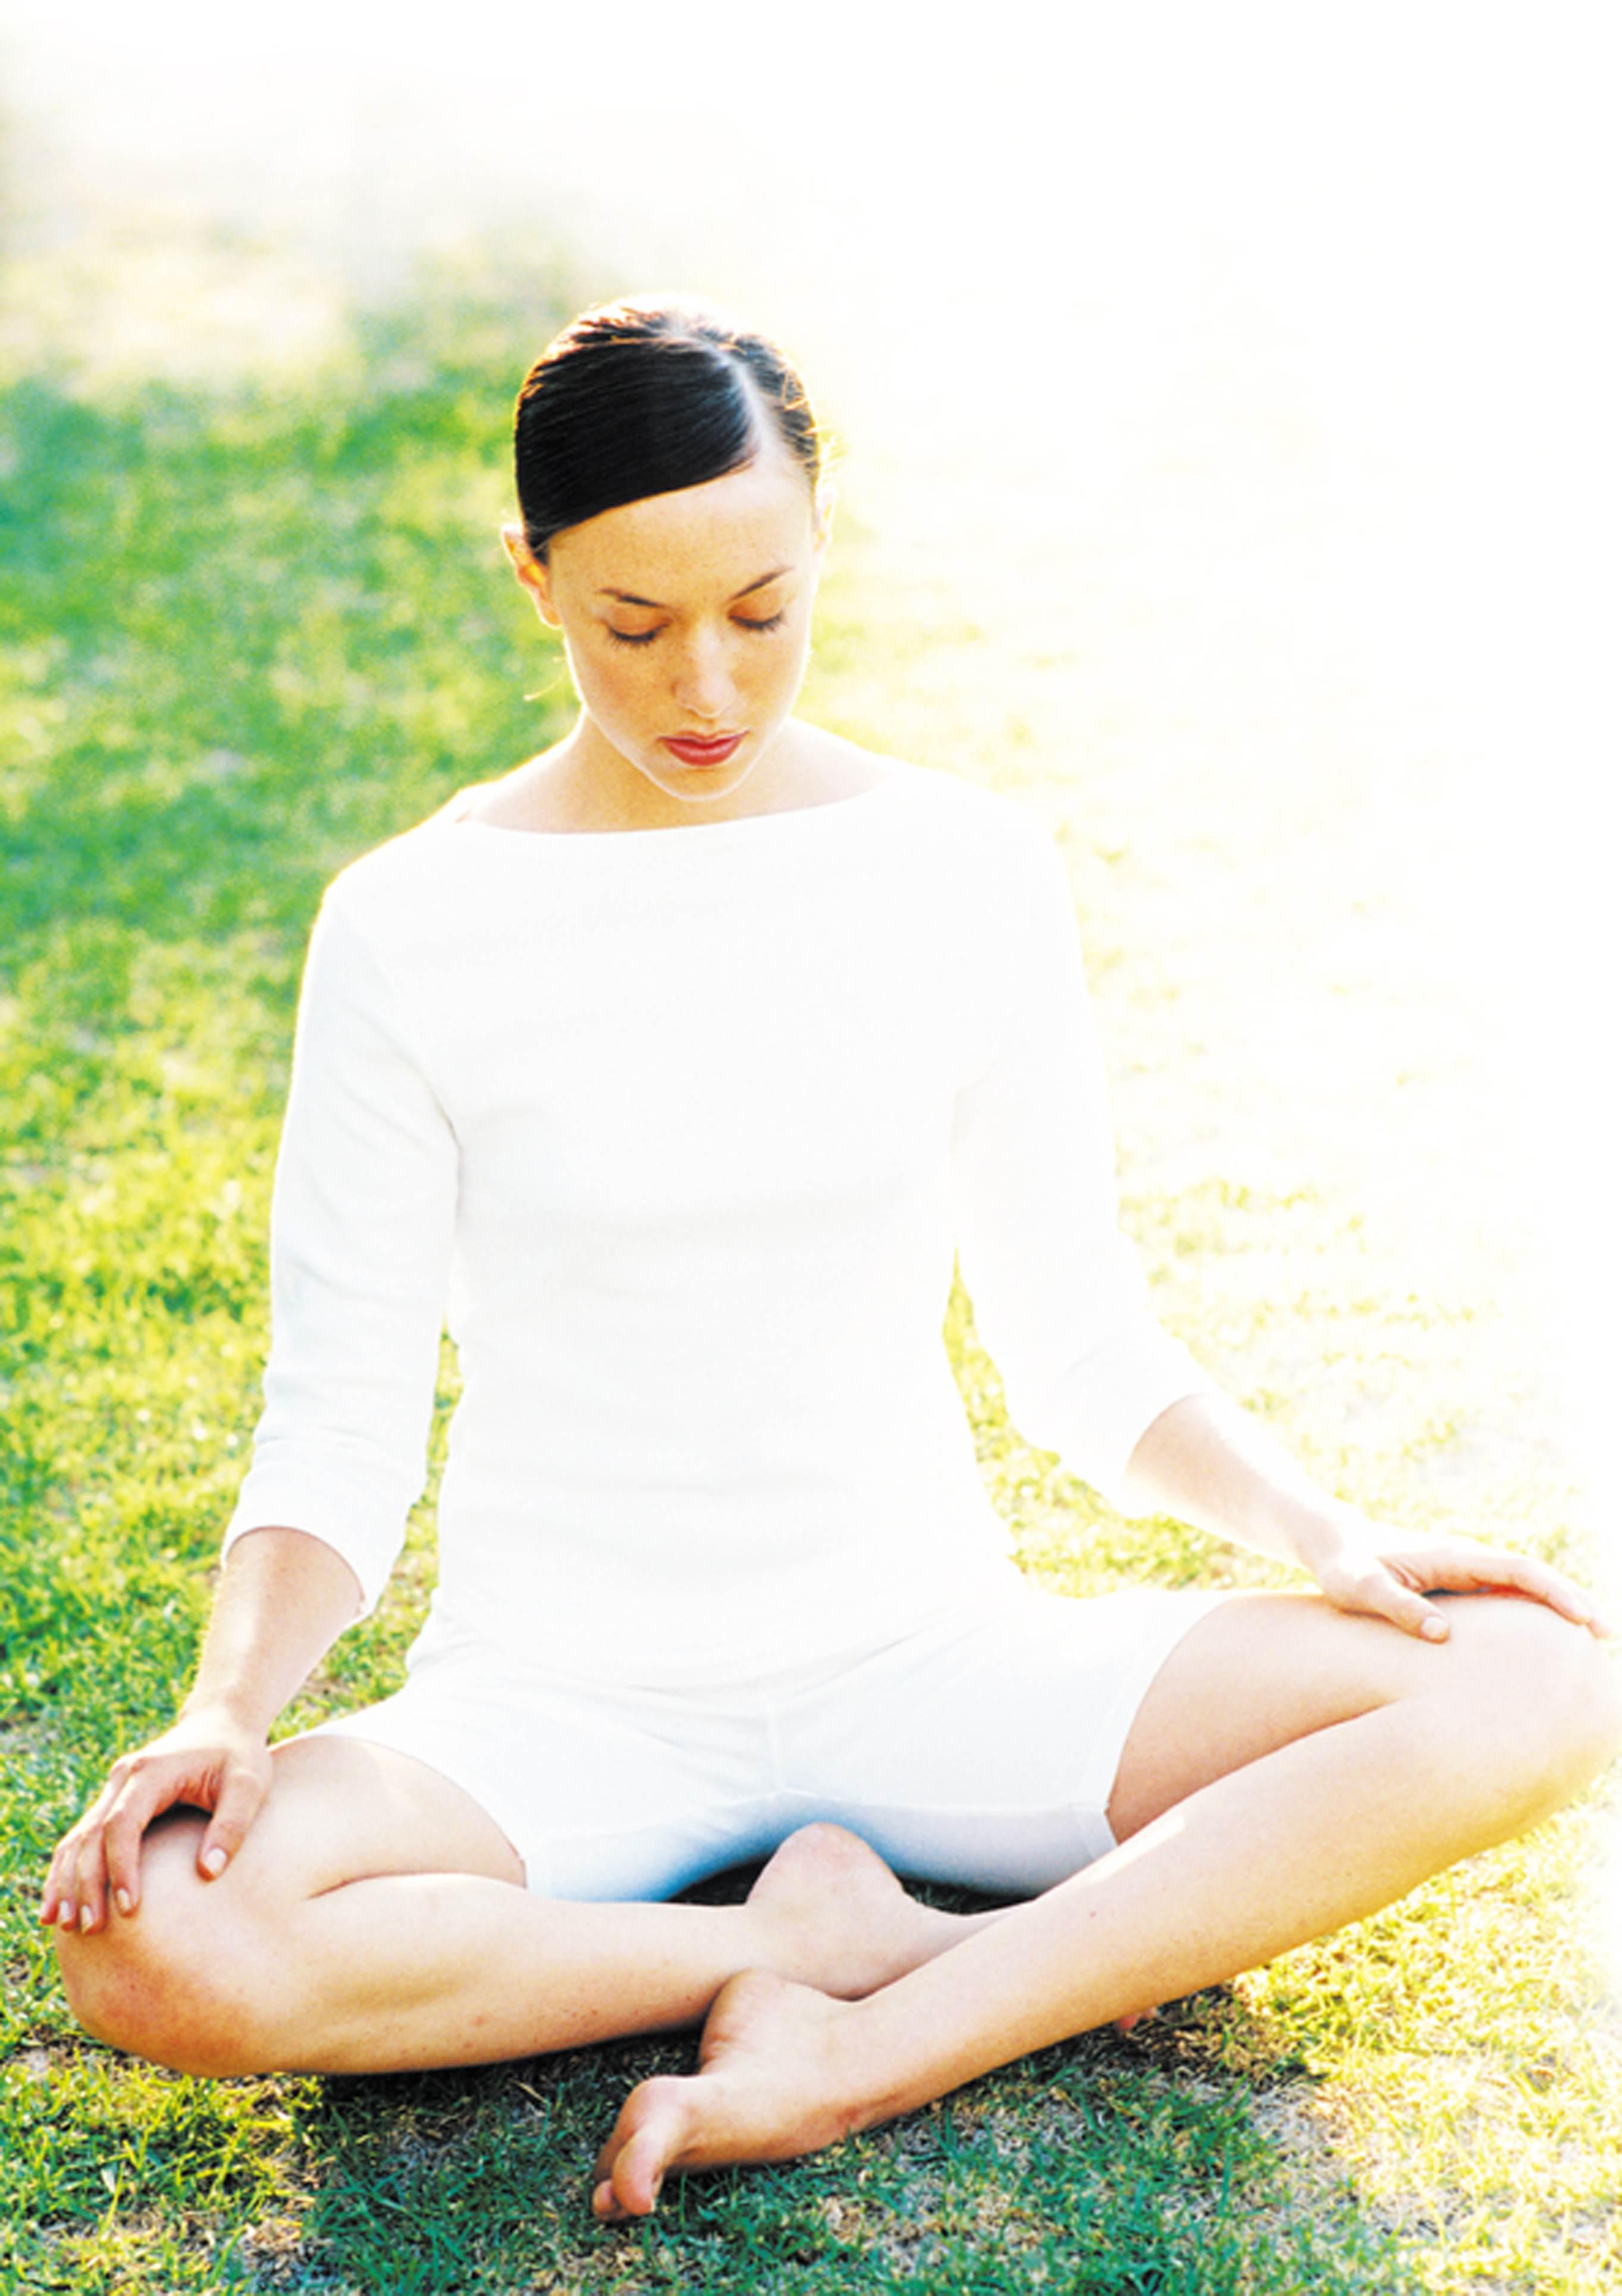 Meditation, Stress Free Weight loss, Fat loss expert